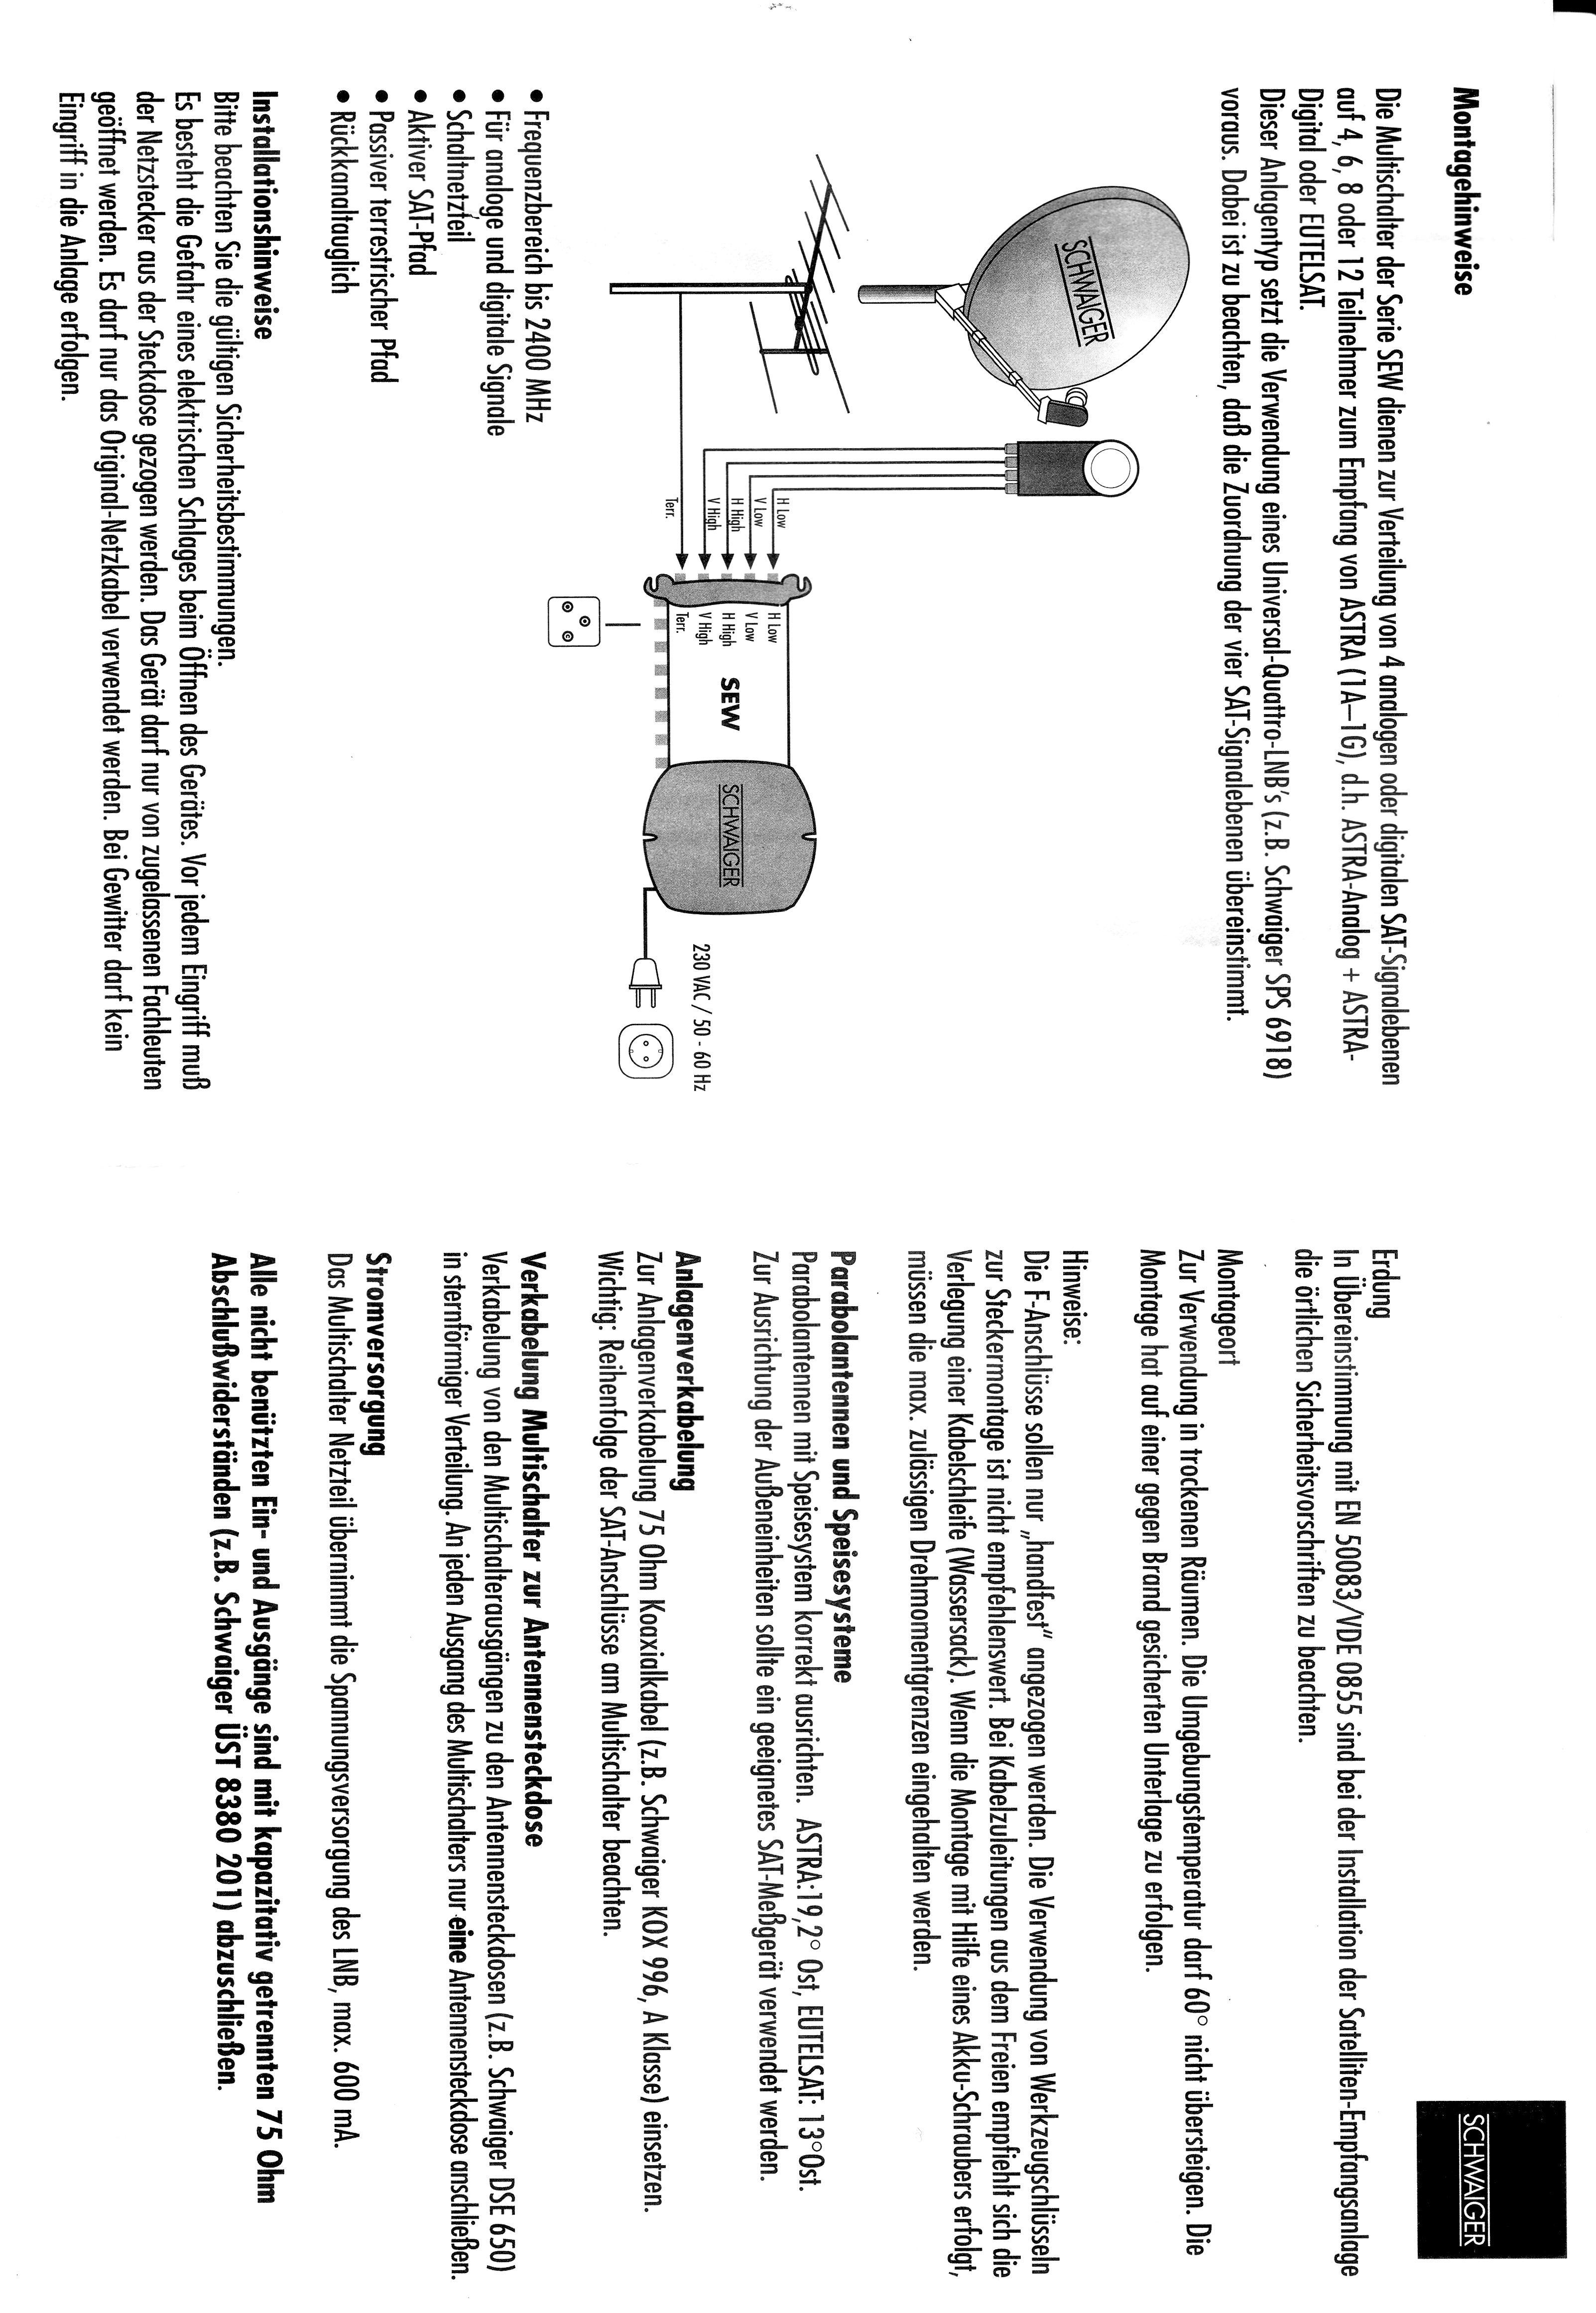 Index of /Empfangskomponenten/Multischalter/SEW4554X/Manual